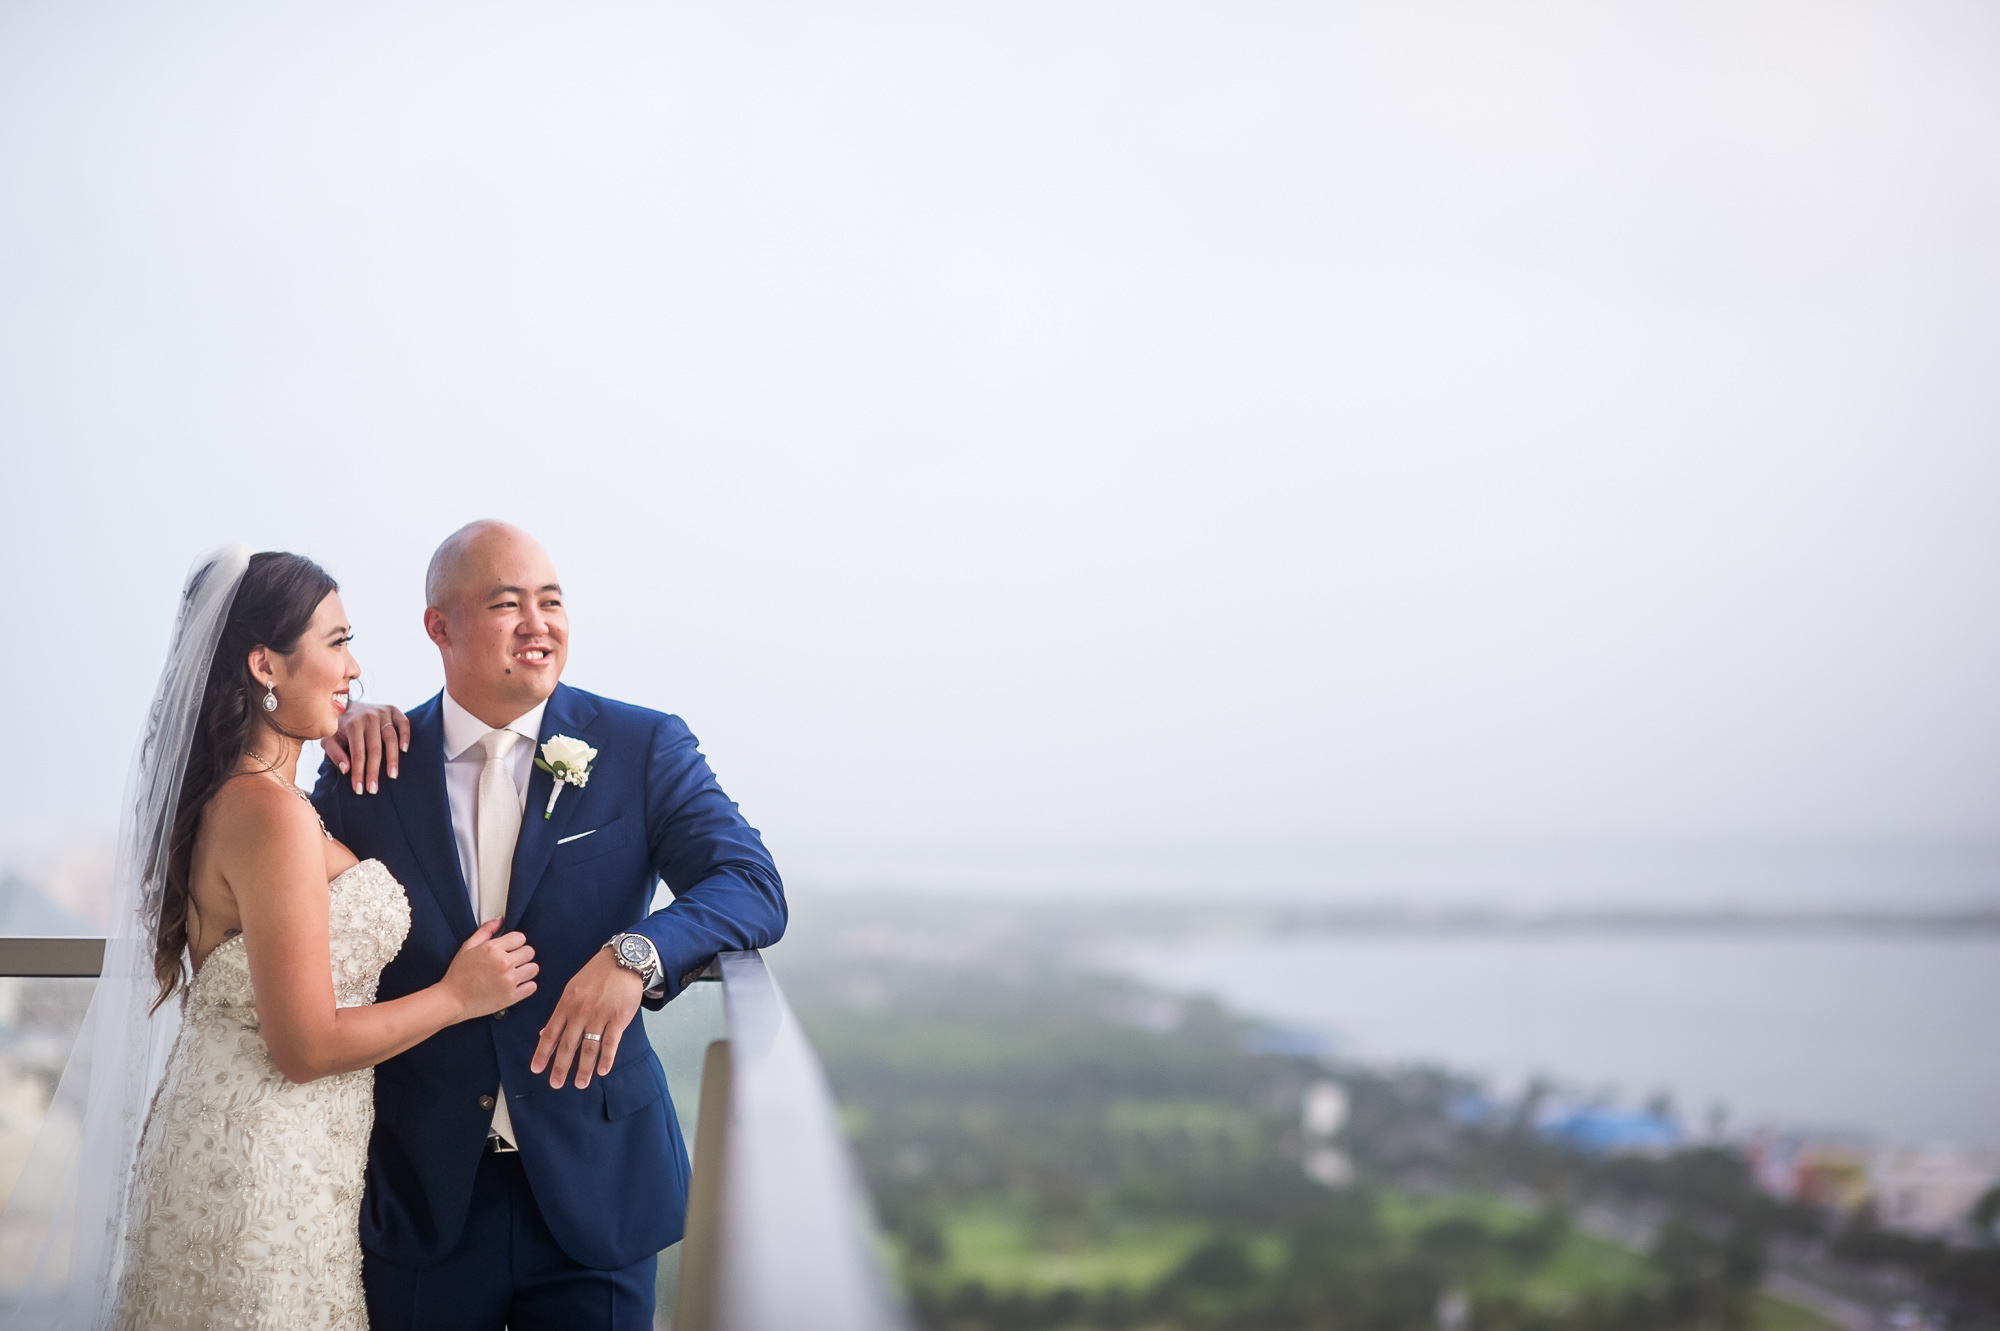 33-David Loi Studios - Cancun - Mexico - Destination Wedding-15712.jpg